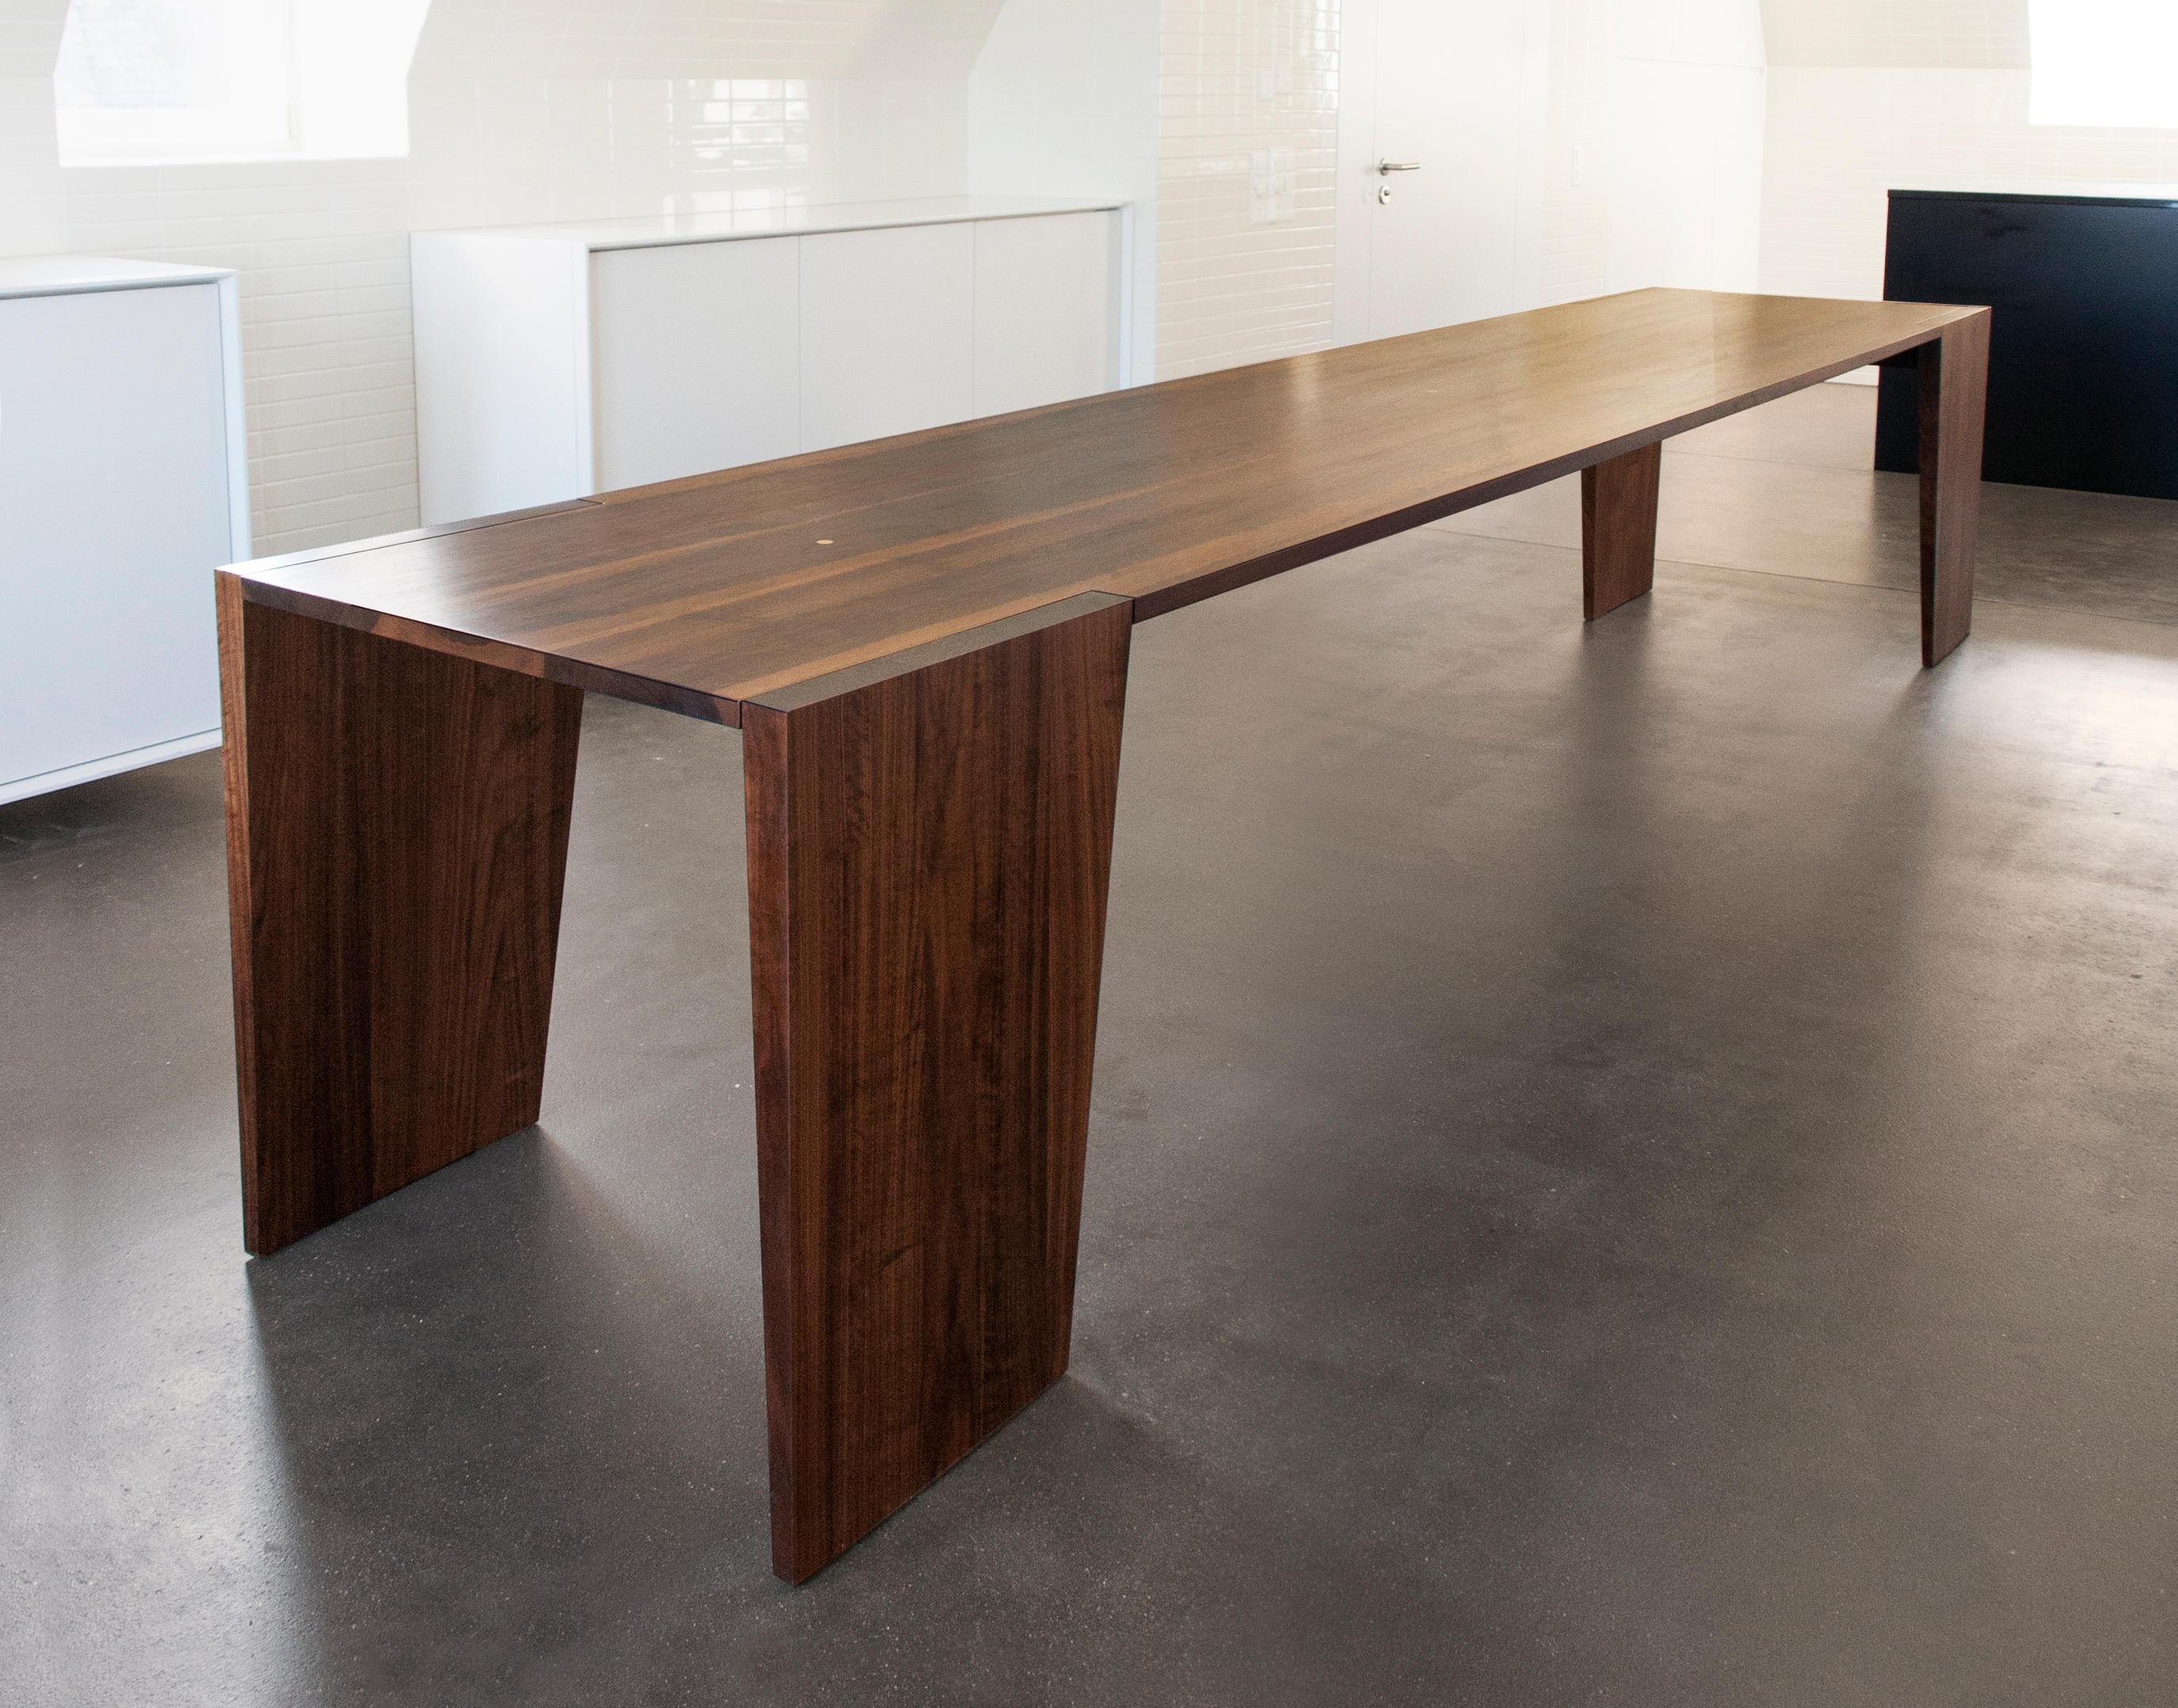 B n tavoli ristorante ondo architonic for Produttori tavoli